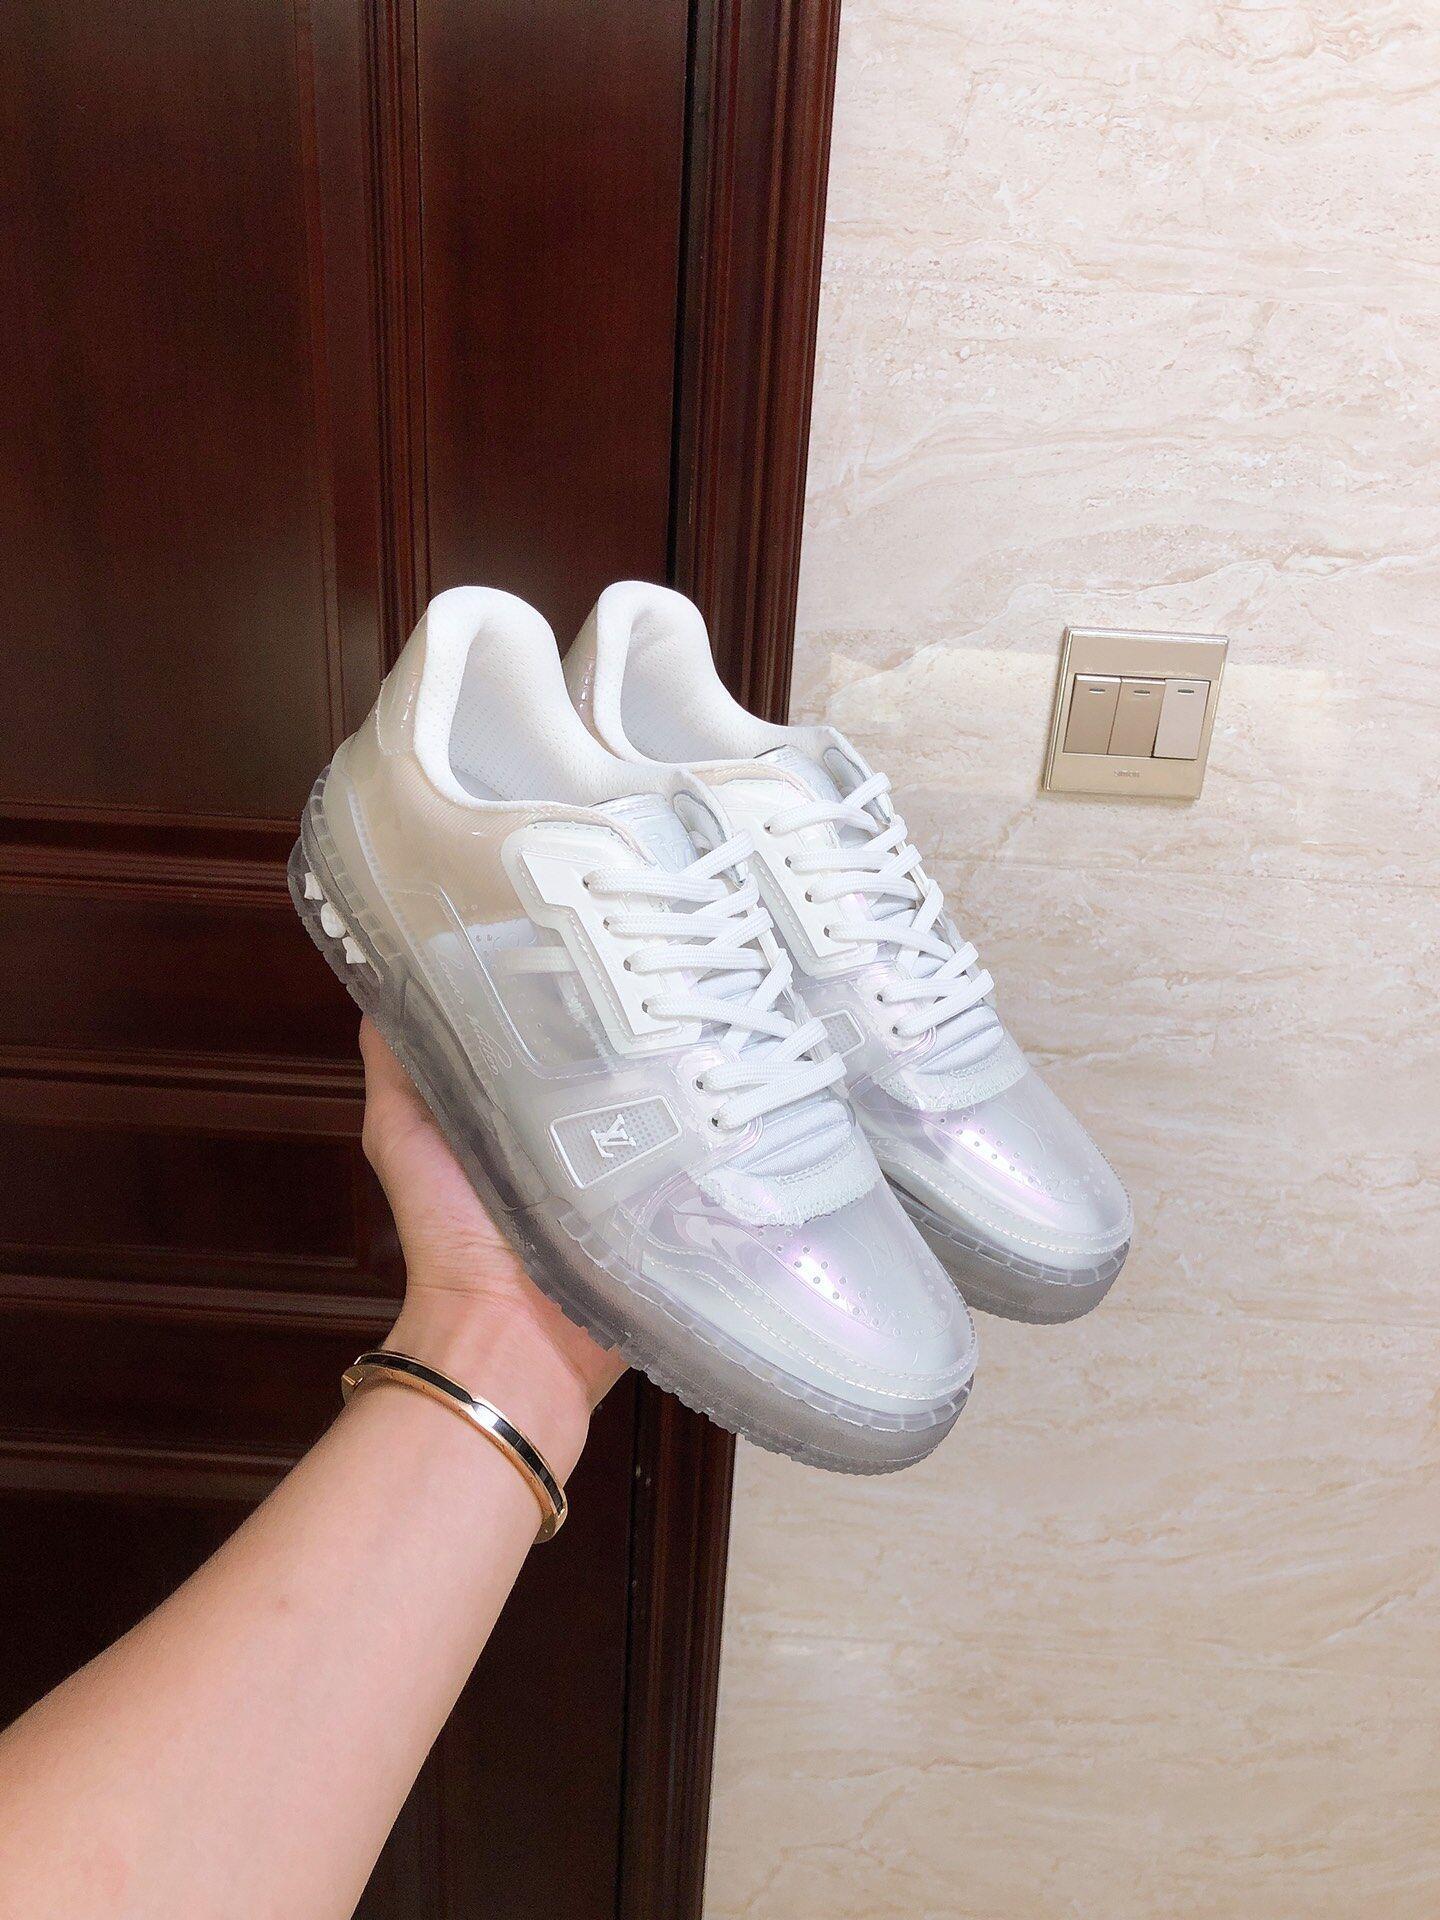 Newest     trainer sneaker    men sneaker    sneaker    shoes 1A5YQY 8